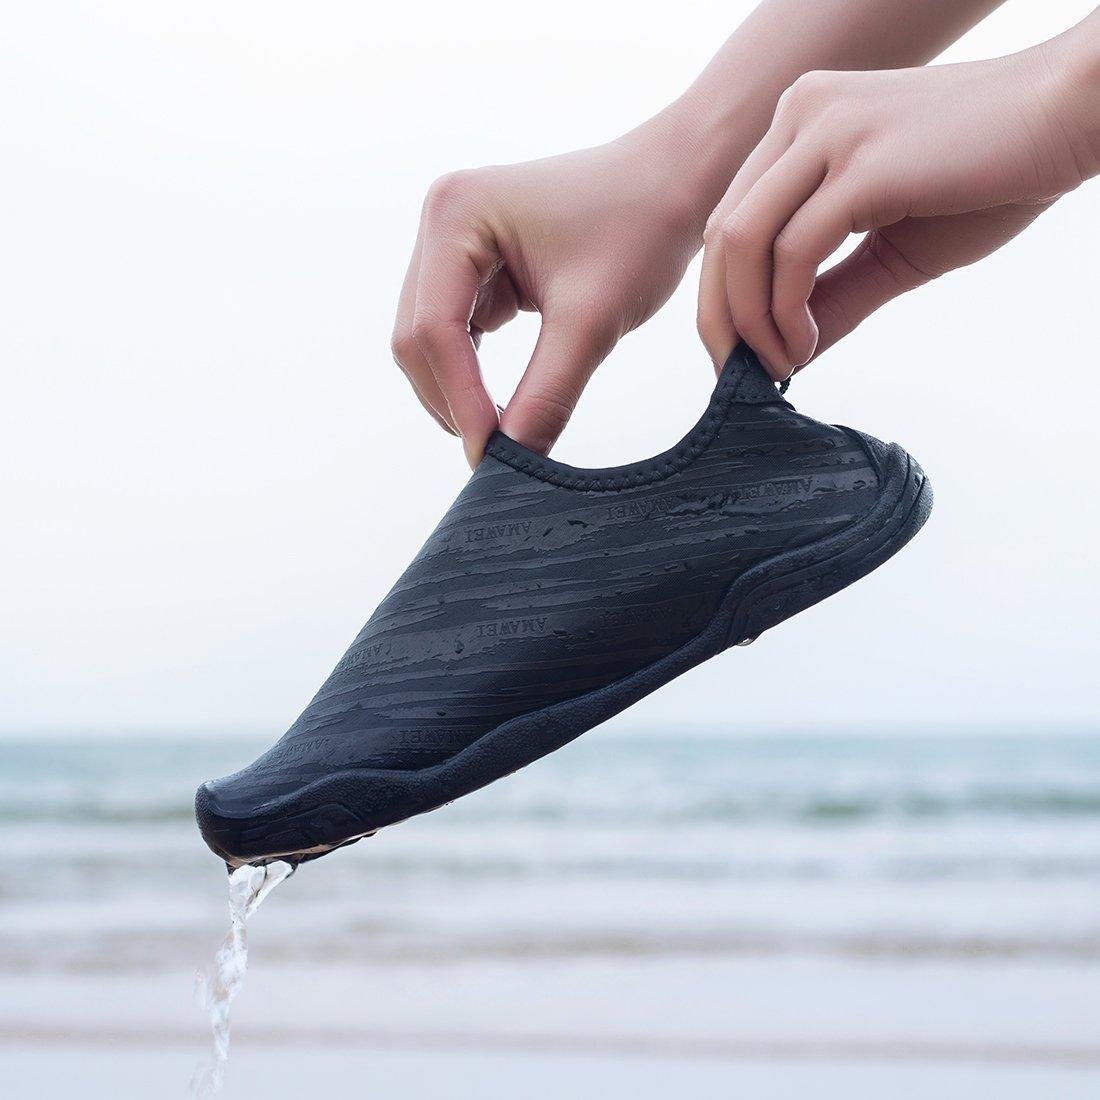 VAMV Water Shoes for Kids Boys Girls Quick Drying Beach Swim Shoe Sneakers Slip On Aqua Sock(Little Kid/Big Kid) (4, Black) by VAMV (Image #2)